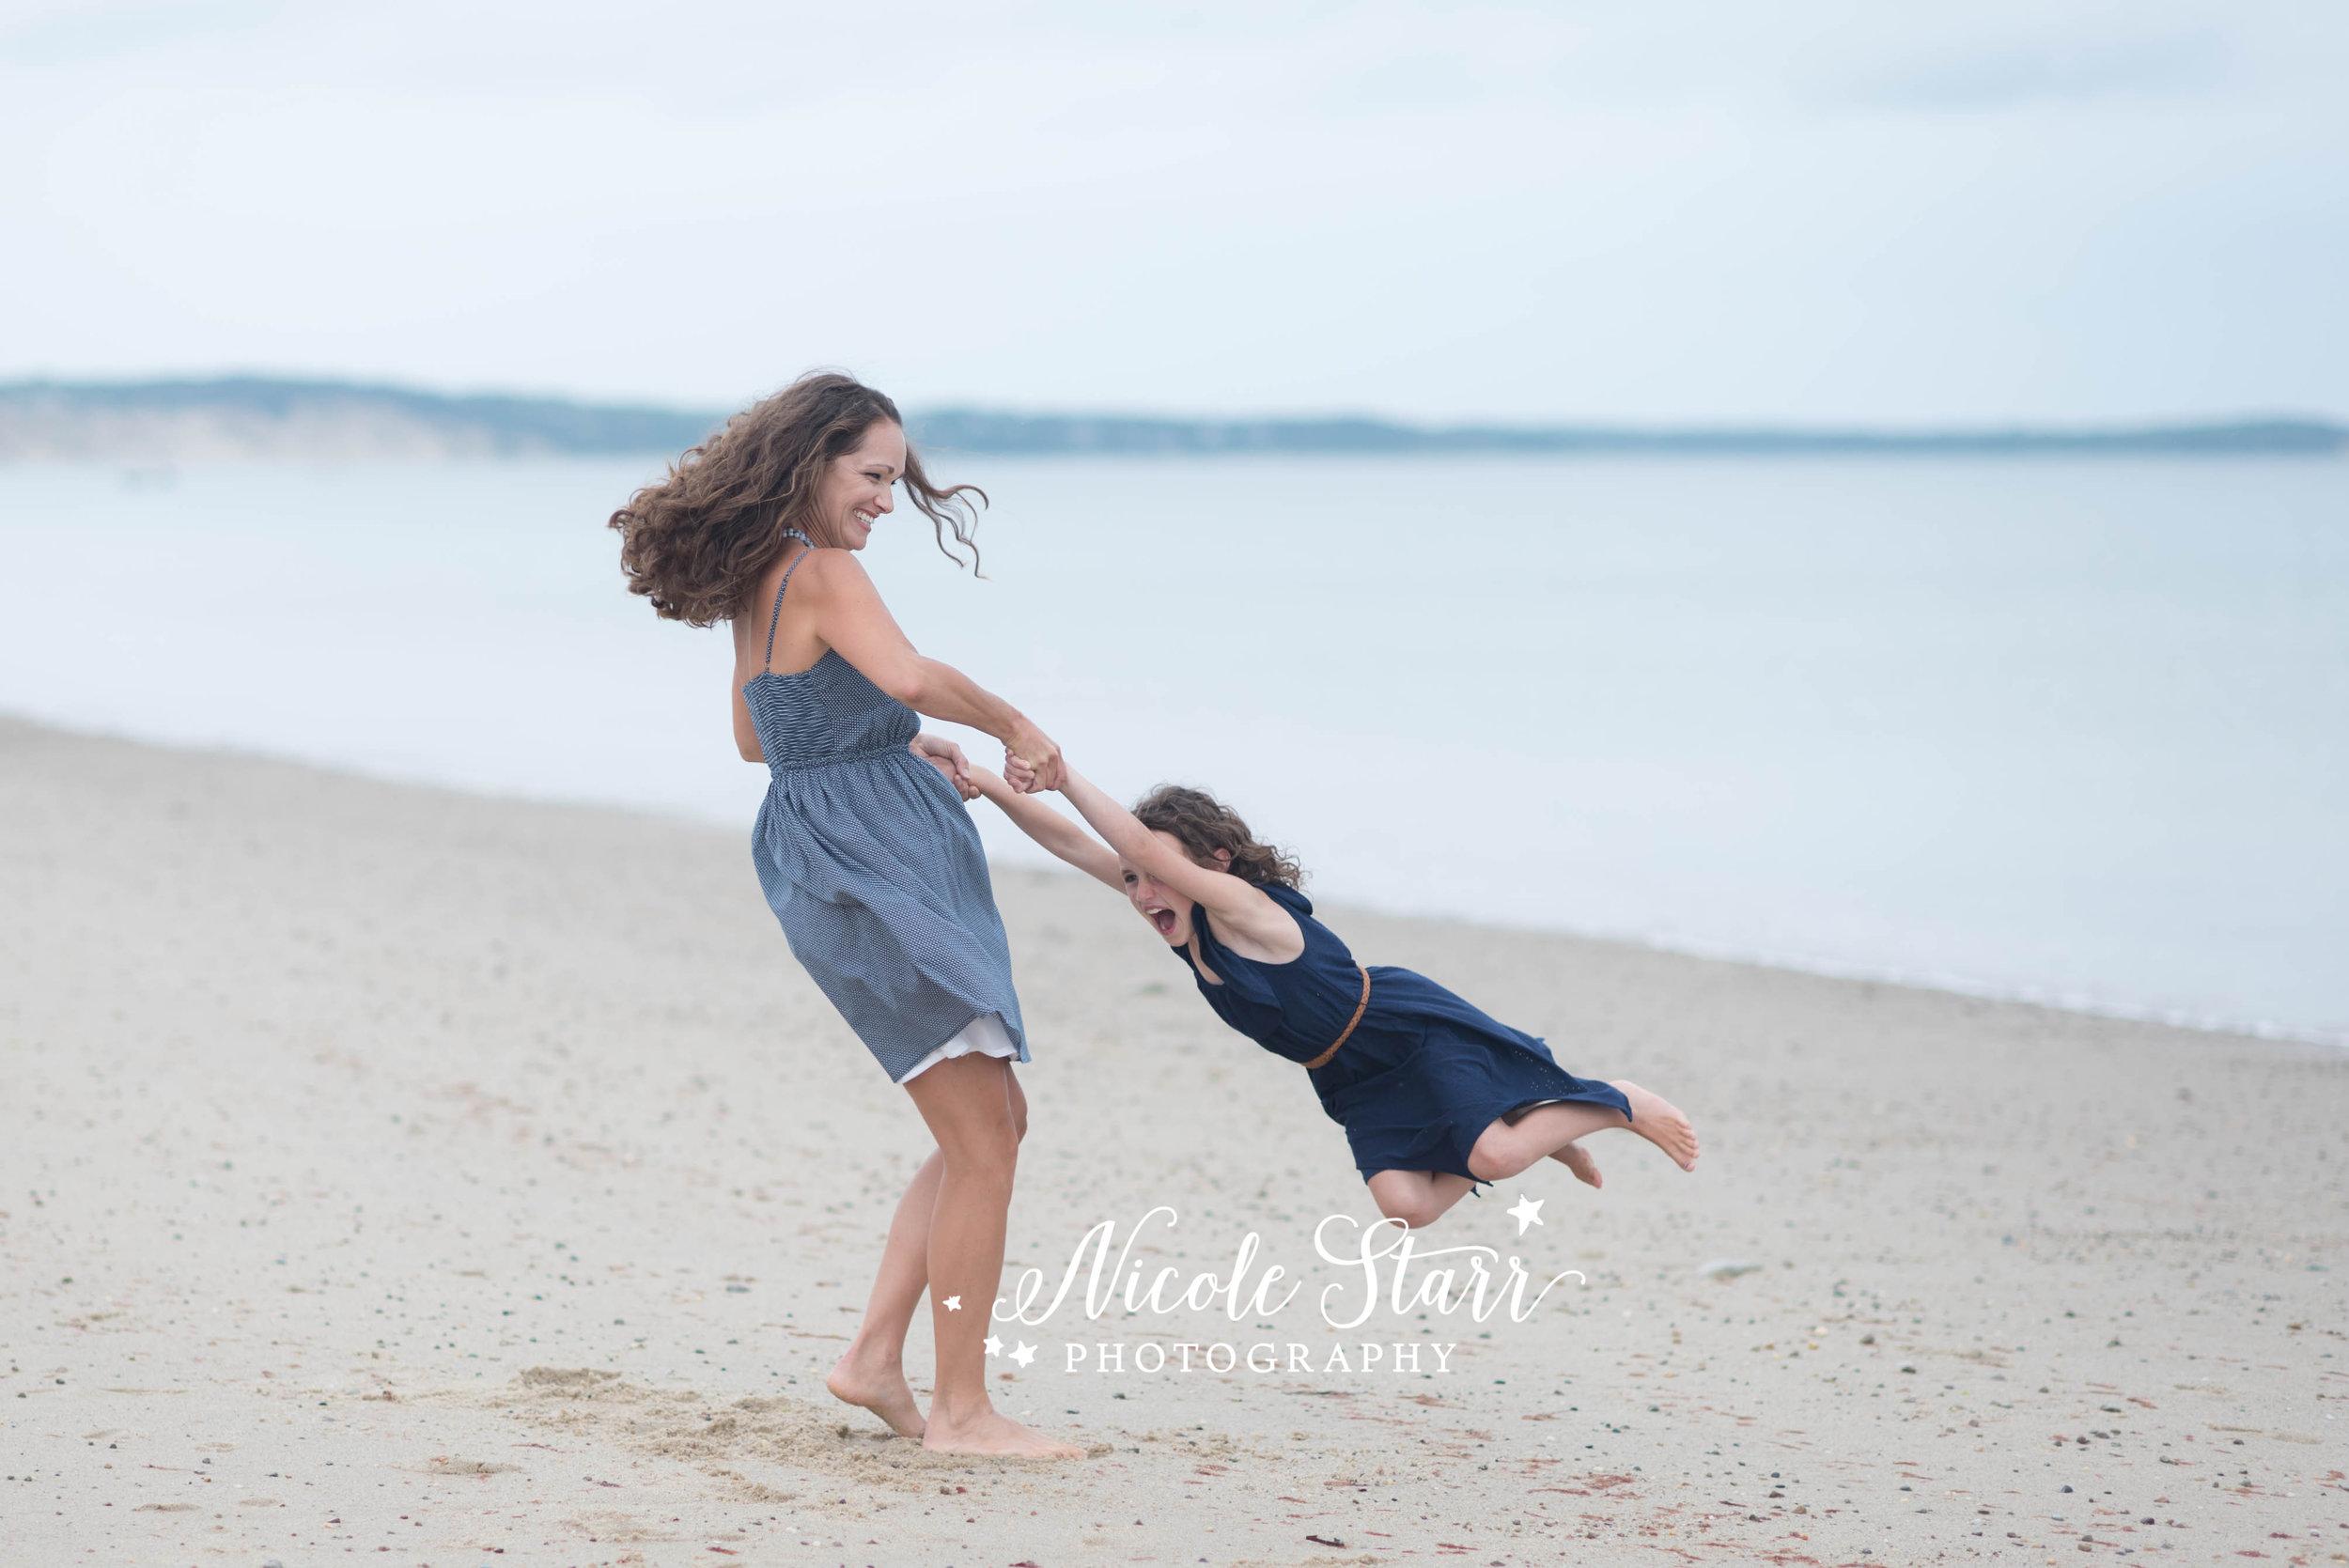 Nicole Starr Photography | Cape Cod Family Photographer | Boston Family Photographer | Family Photographer | Beach Family Photographer | Massachusetts Family Photographer